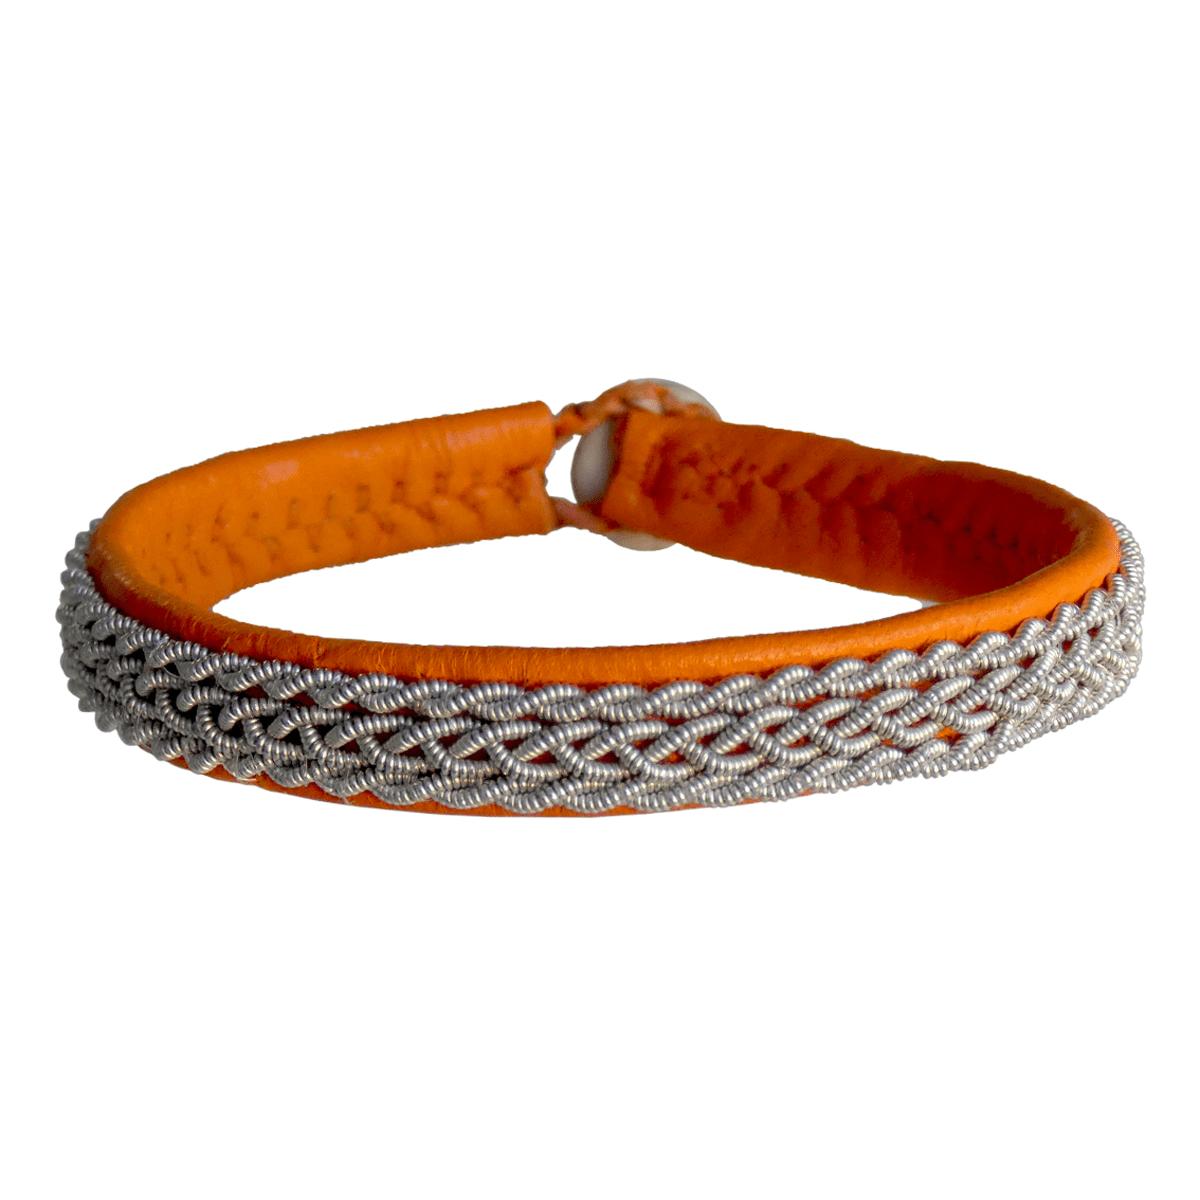 Empreinte Nomade, bracelet Lapon Mika Coloris Orange - cassisroyal.com